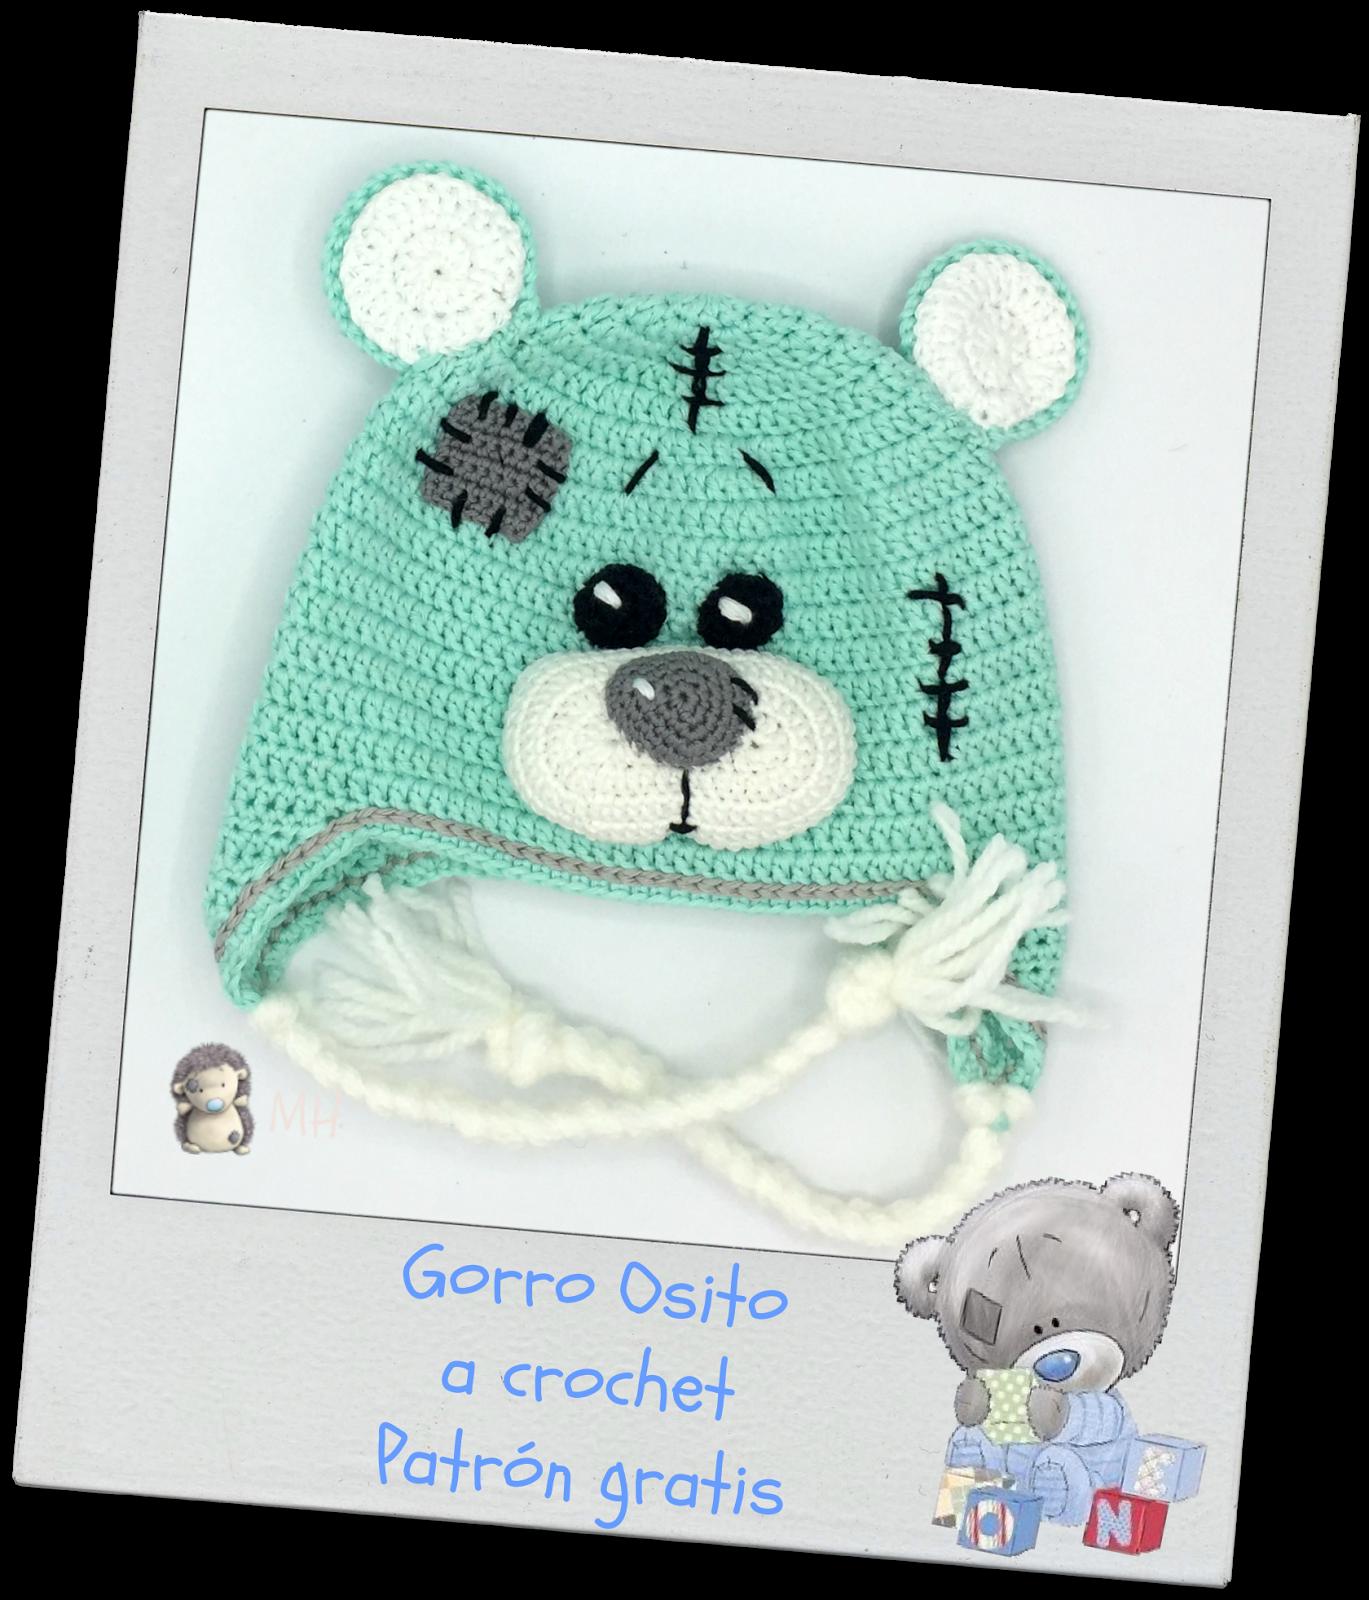 Gorro osito de peluche a crochet | hats | Pinterest | Osos, Gorros y ...